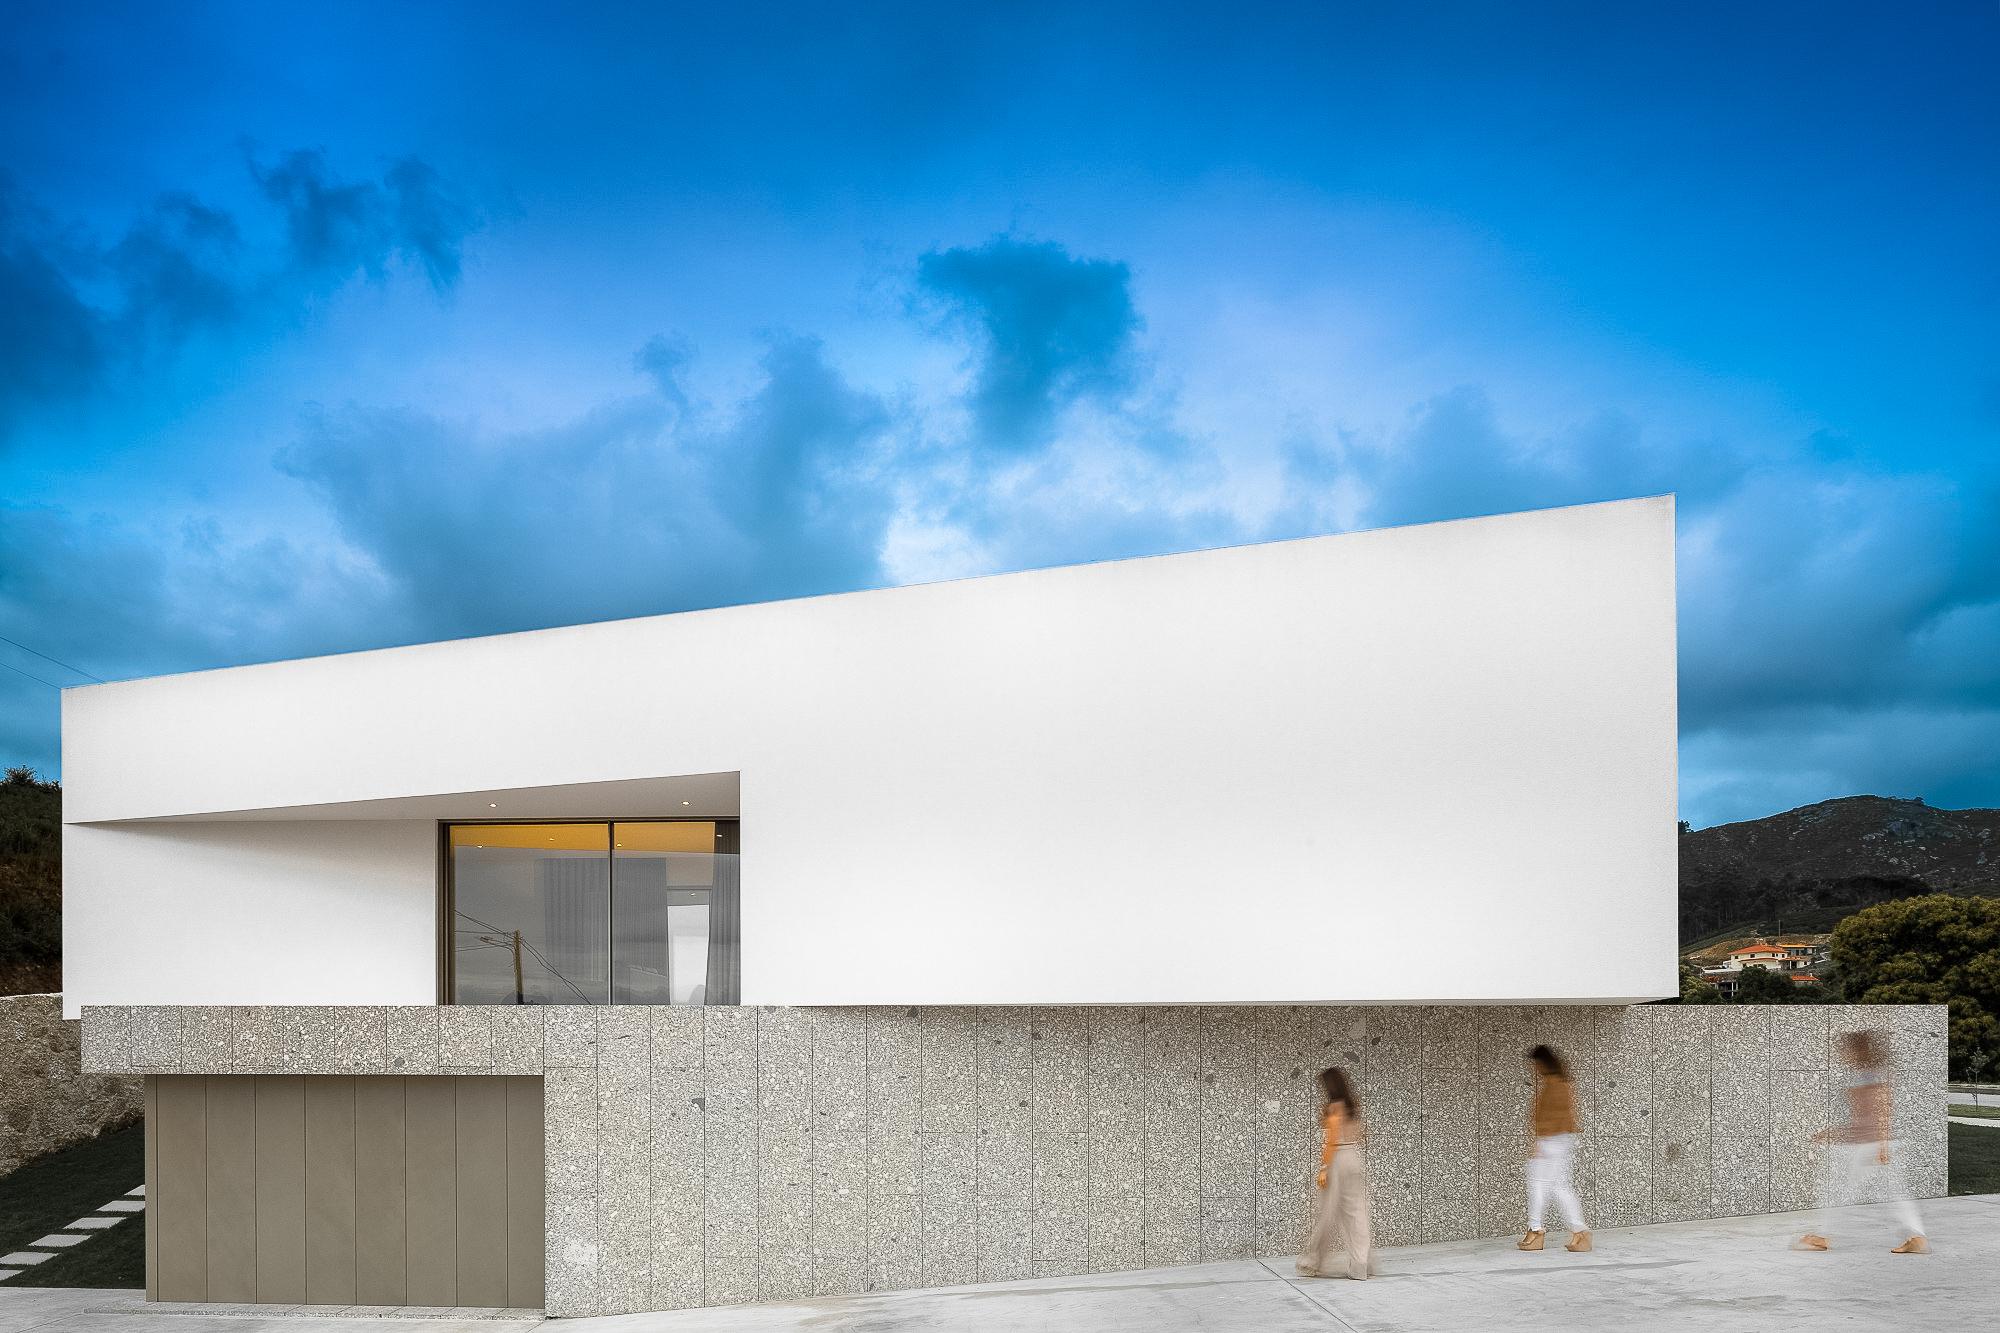 Brunhais House / Rui Vieira Oliveira